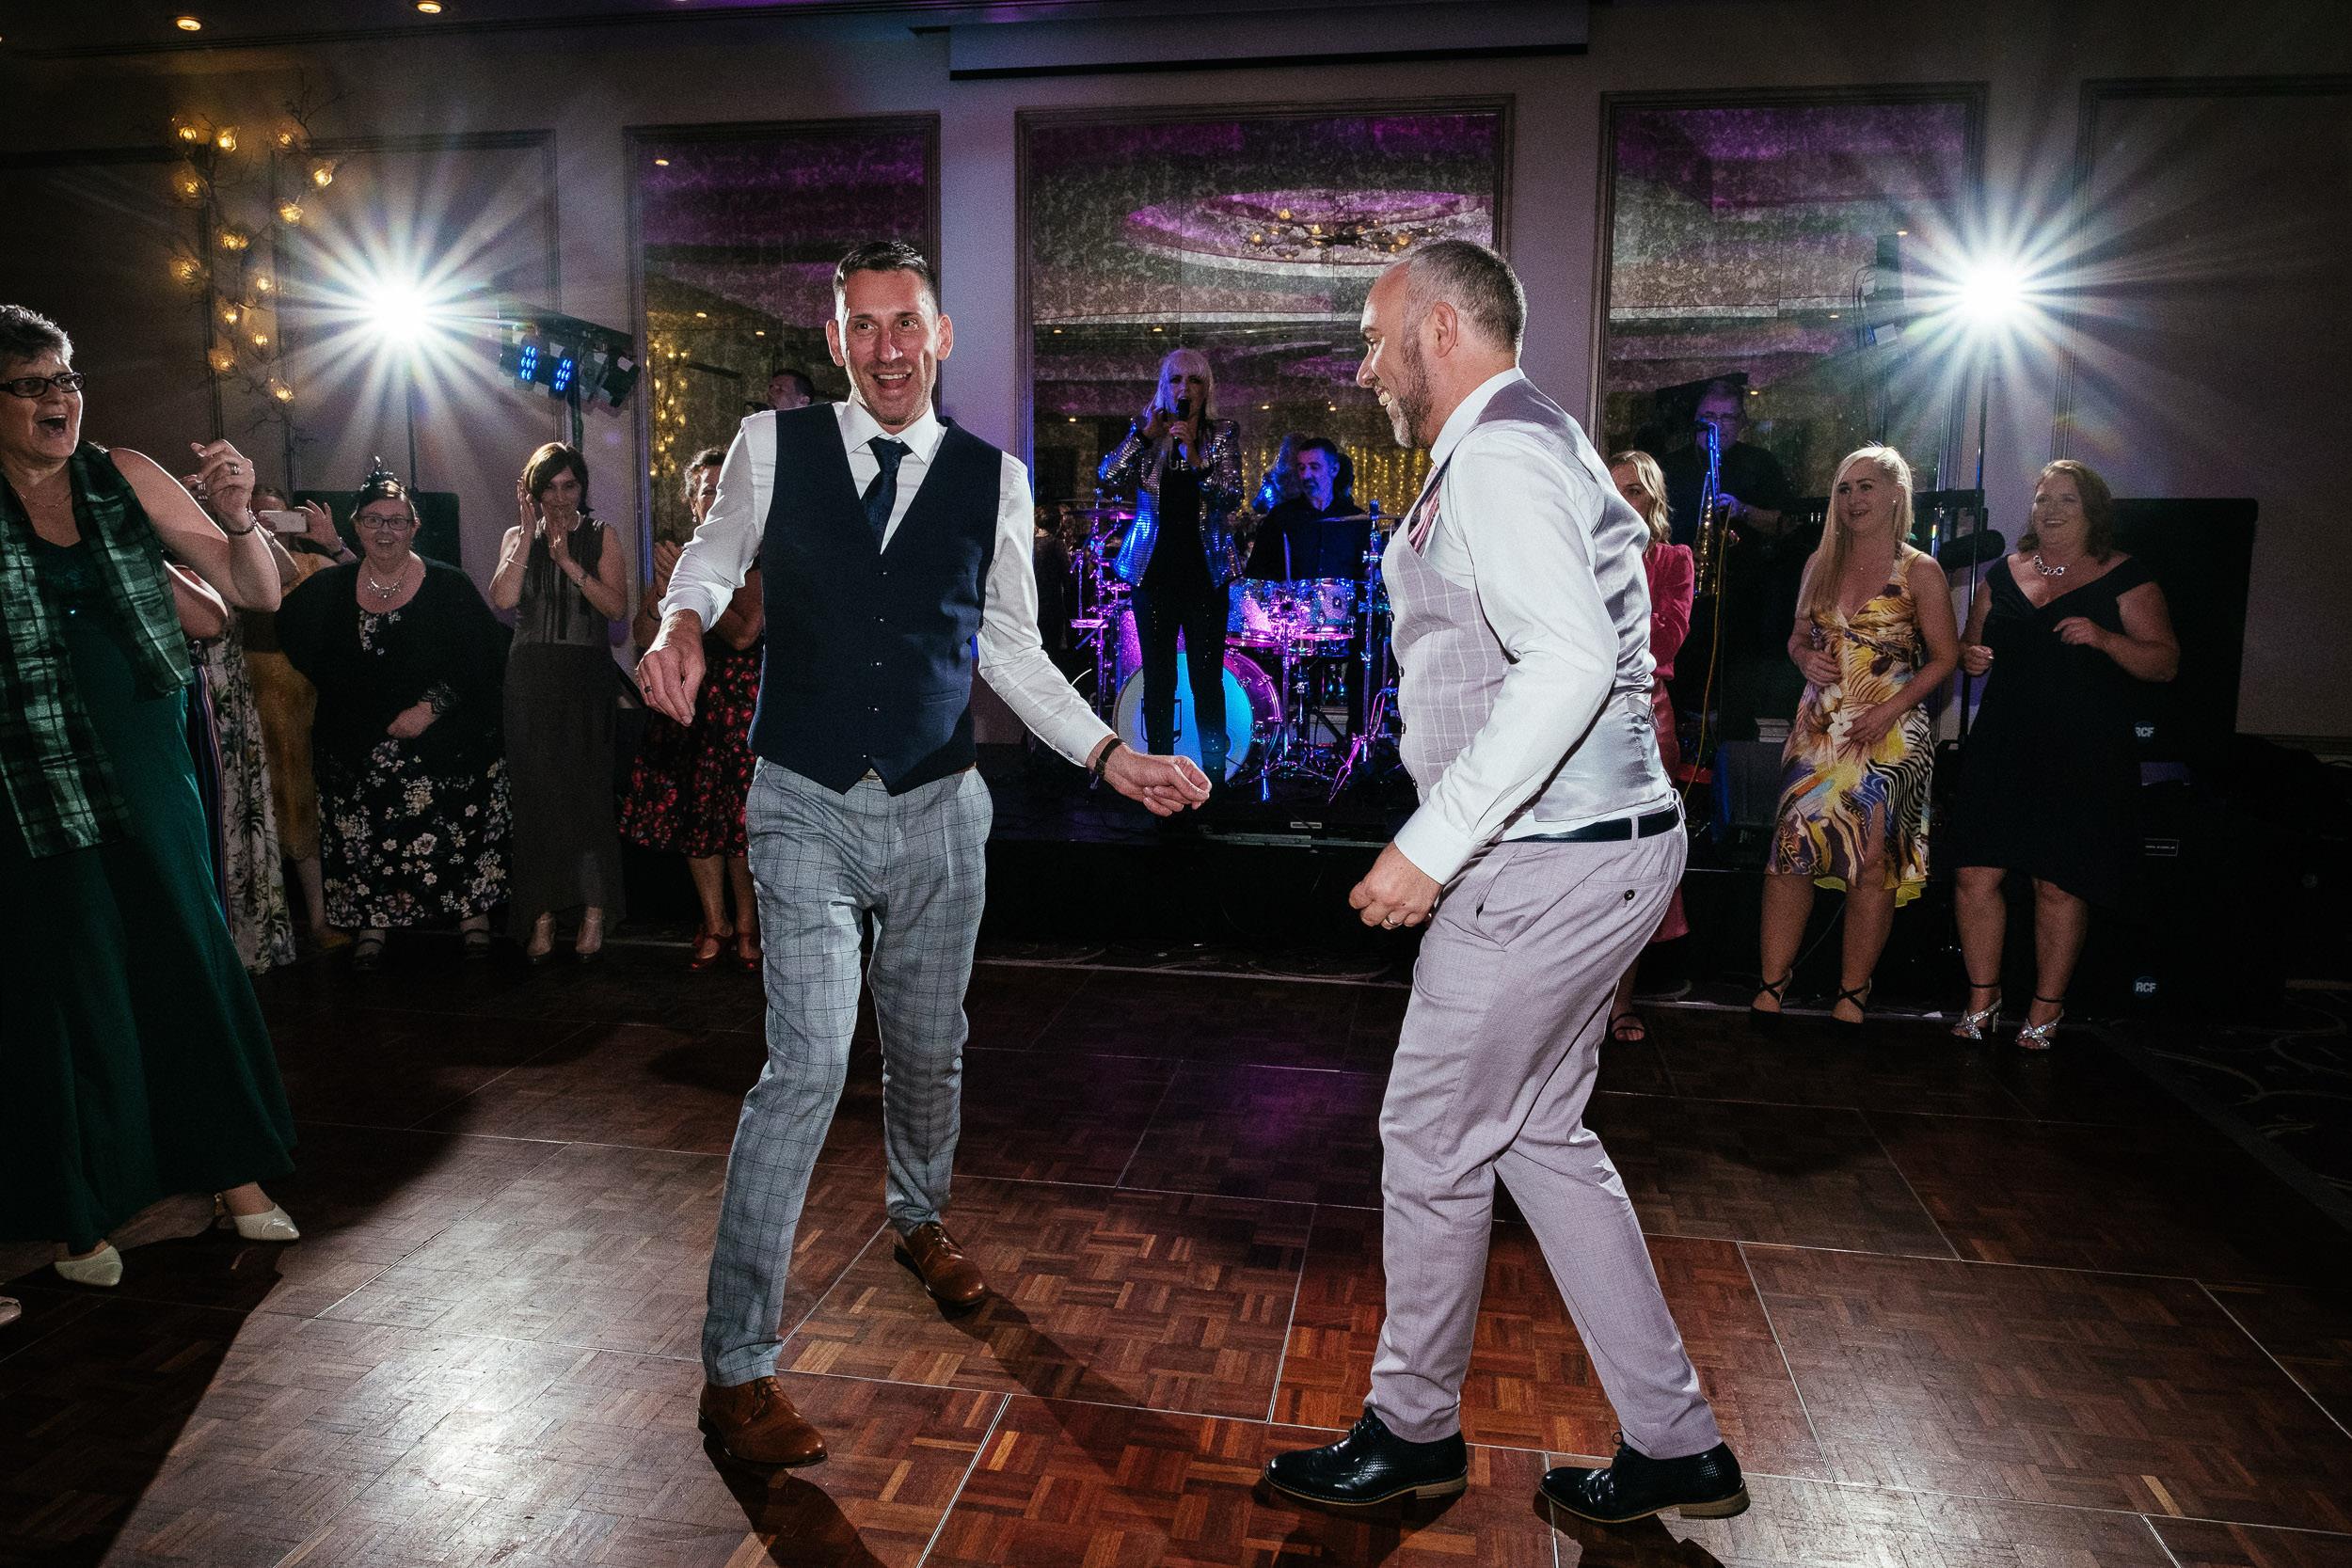 tonyshirley.co.uk: Gay men in Meath, Ireland